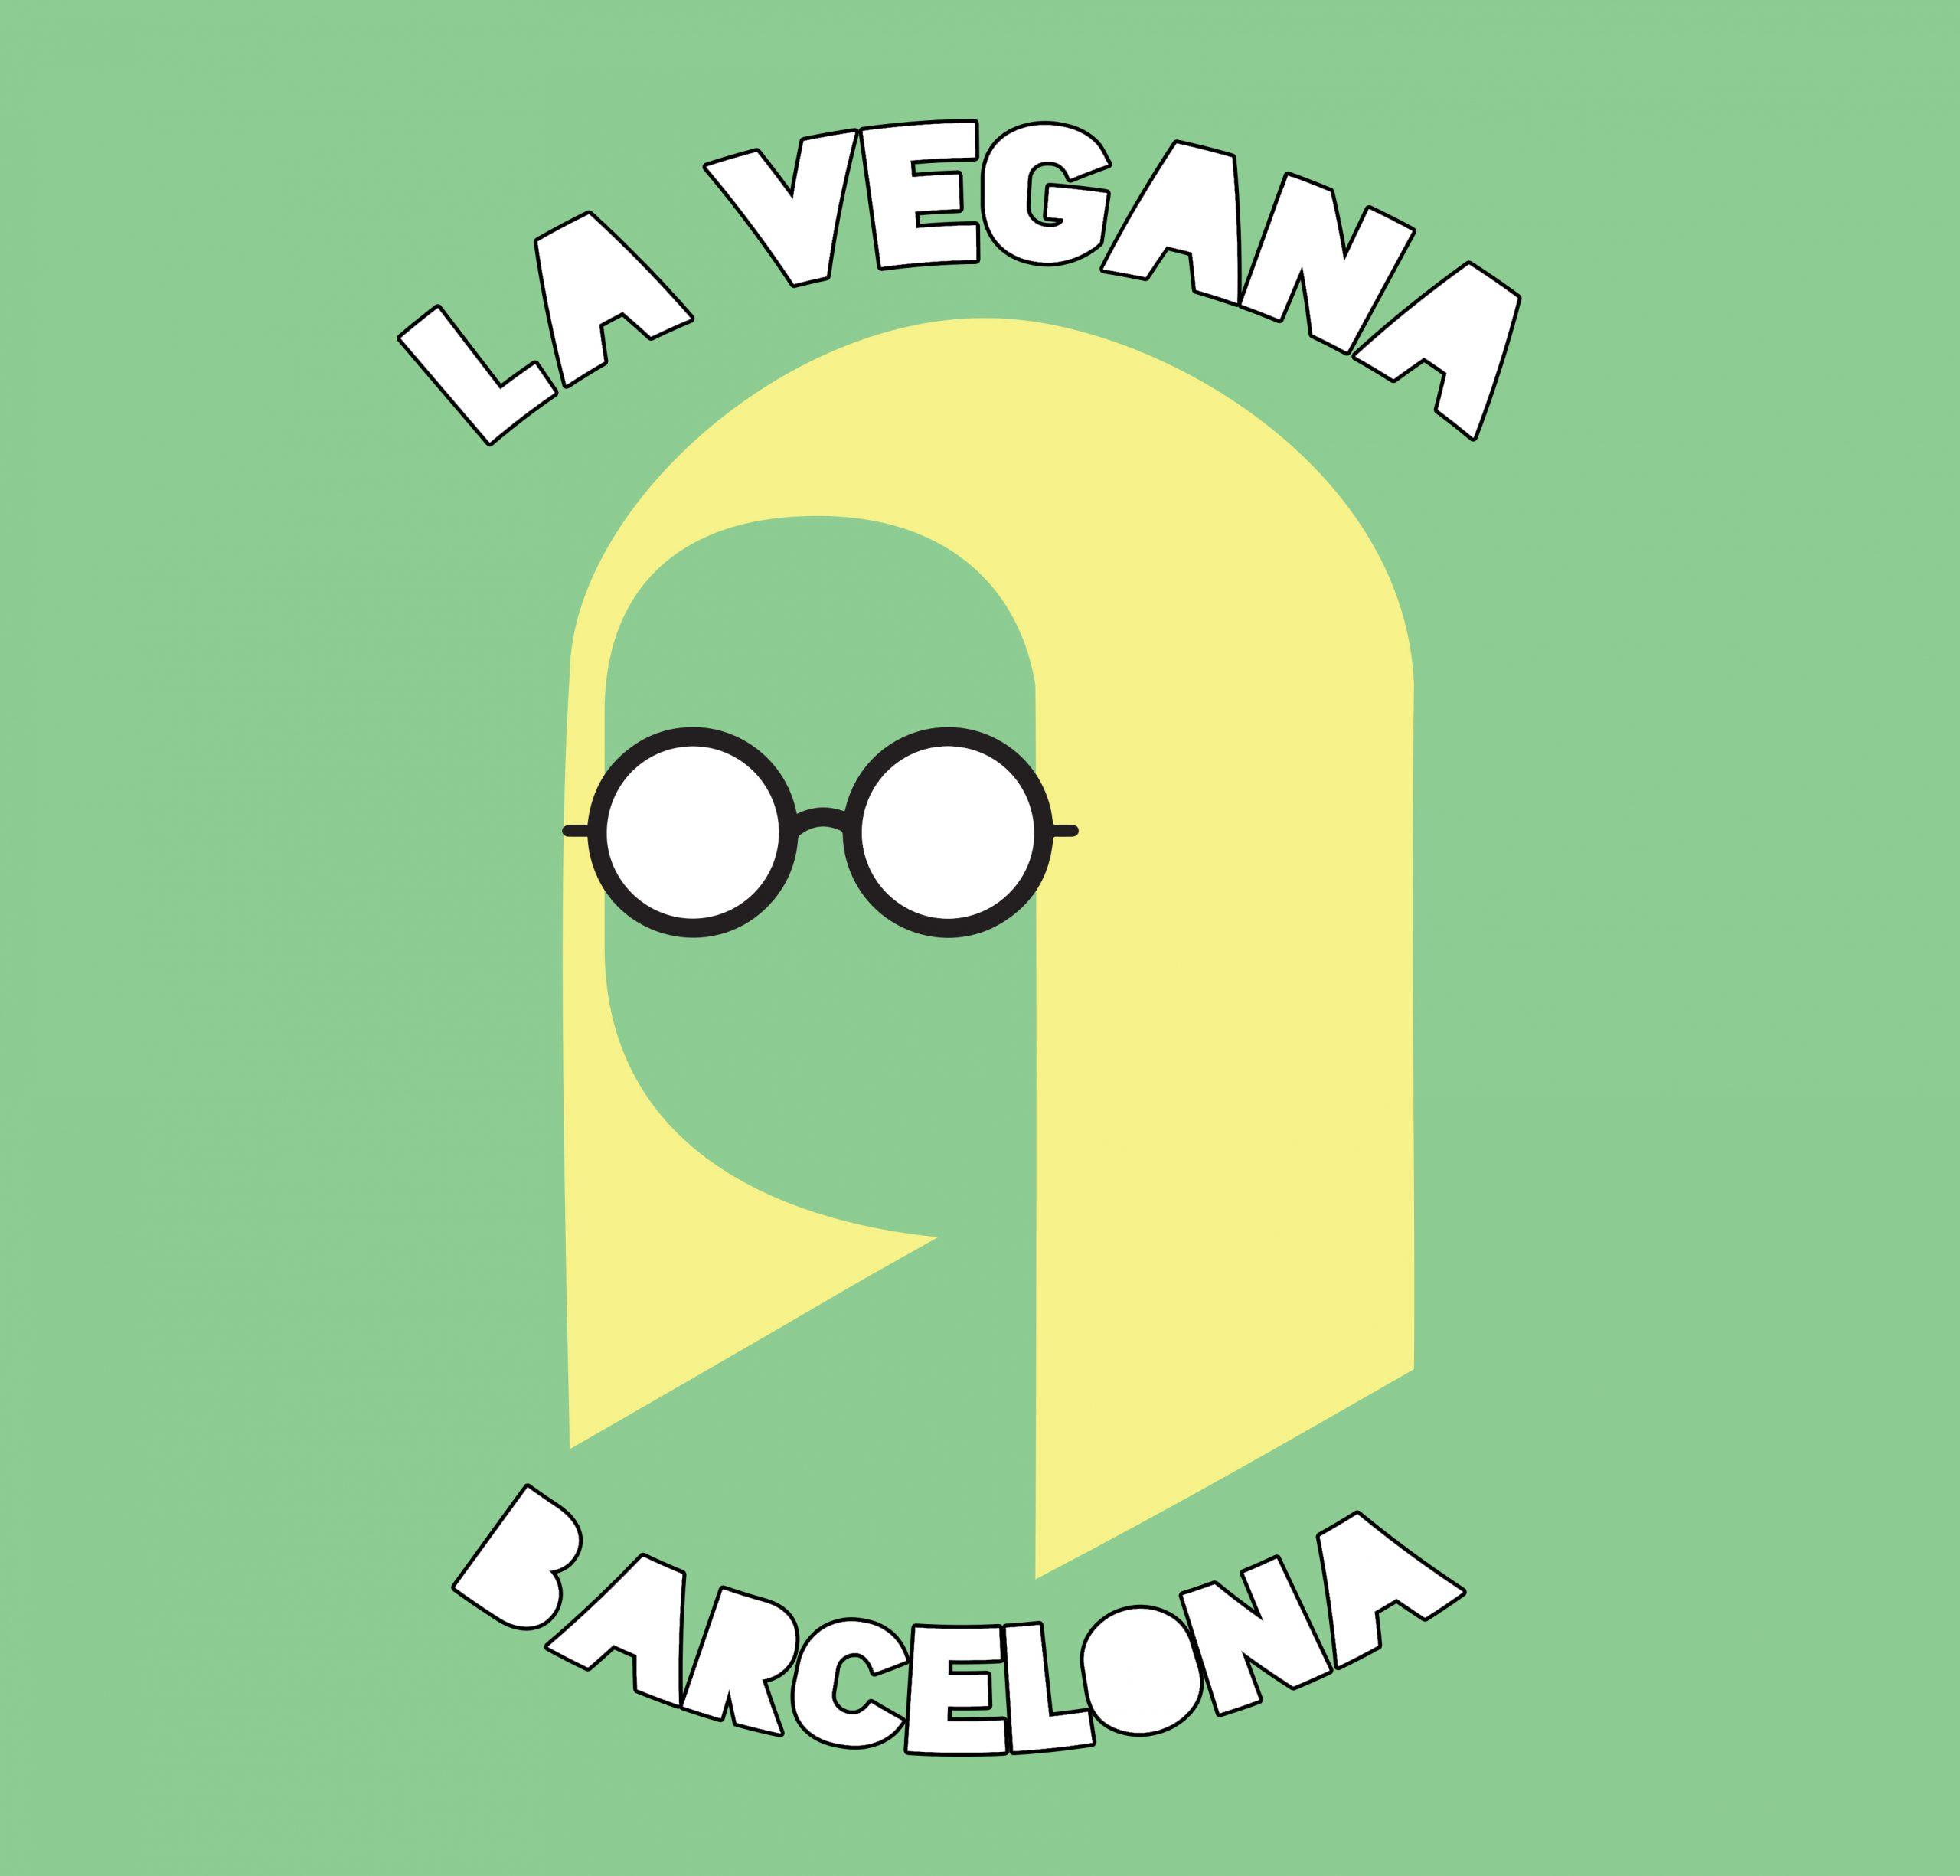 La vegana Barcelona